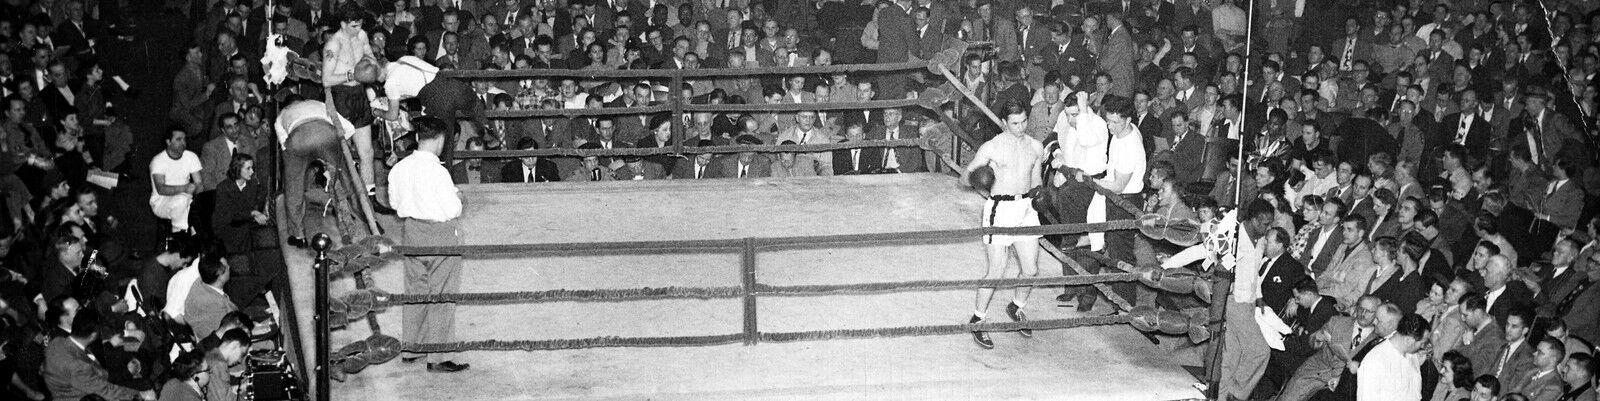 Animo Boxing